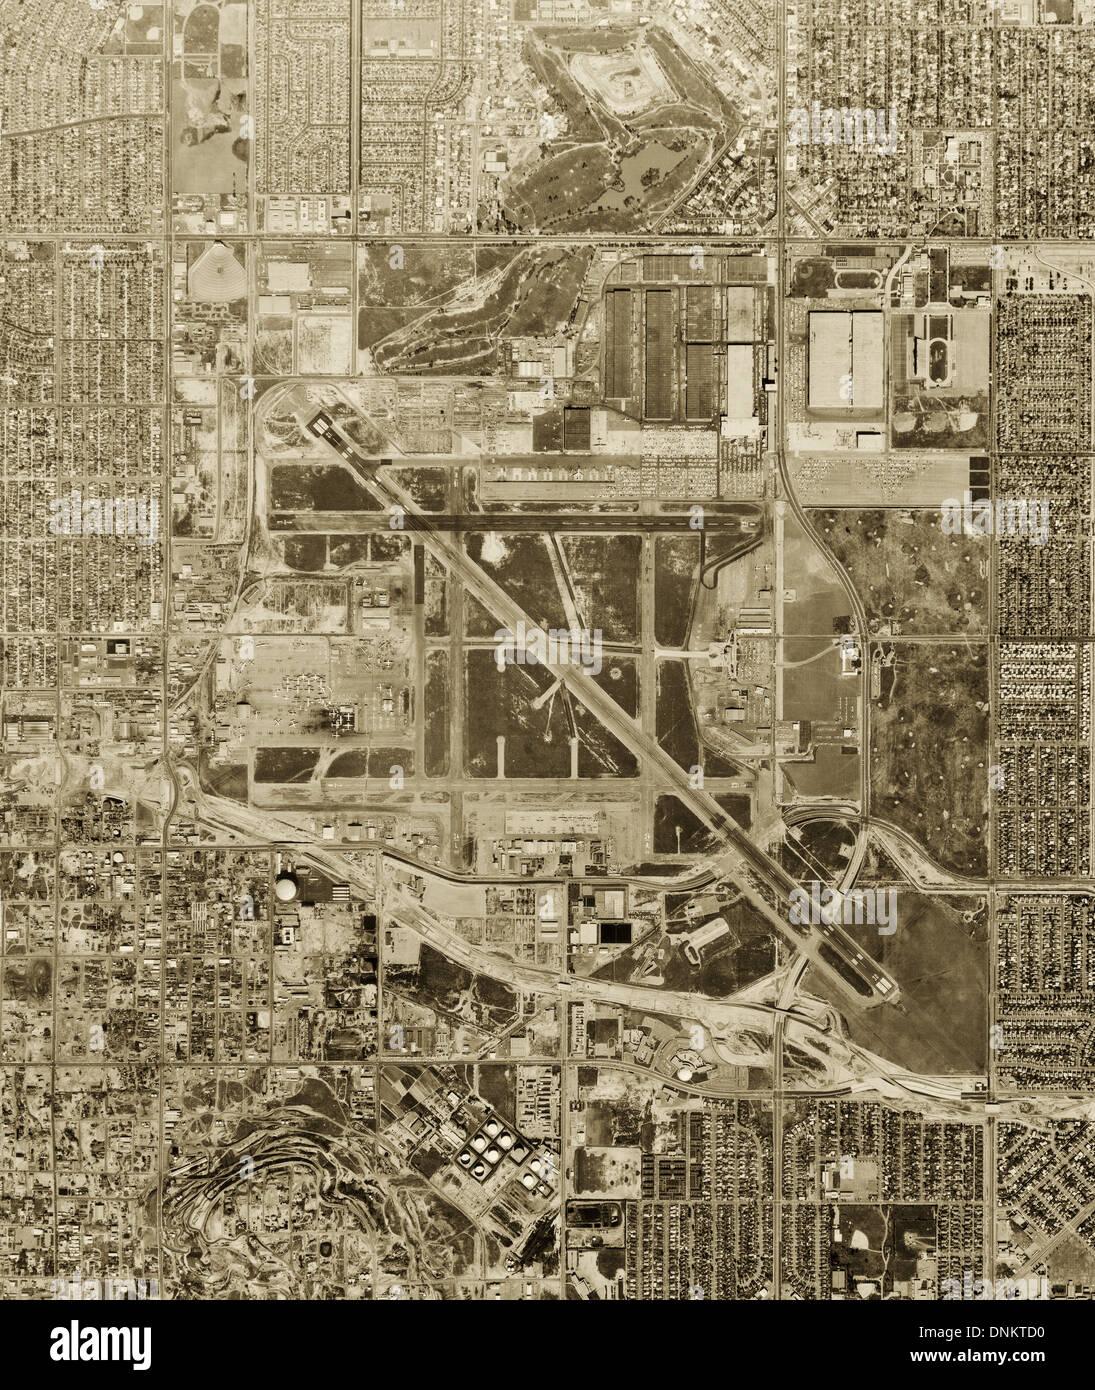 historical aerial photograph Long Beach airport, California, 1963 - Stock Image